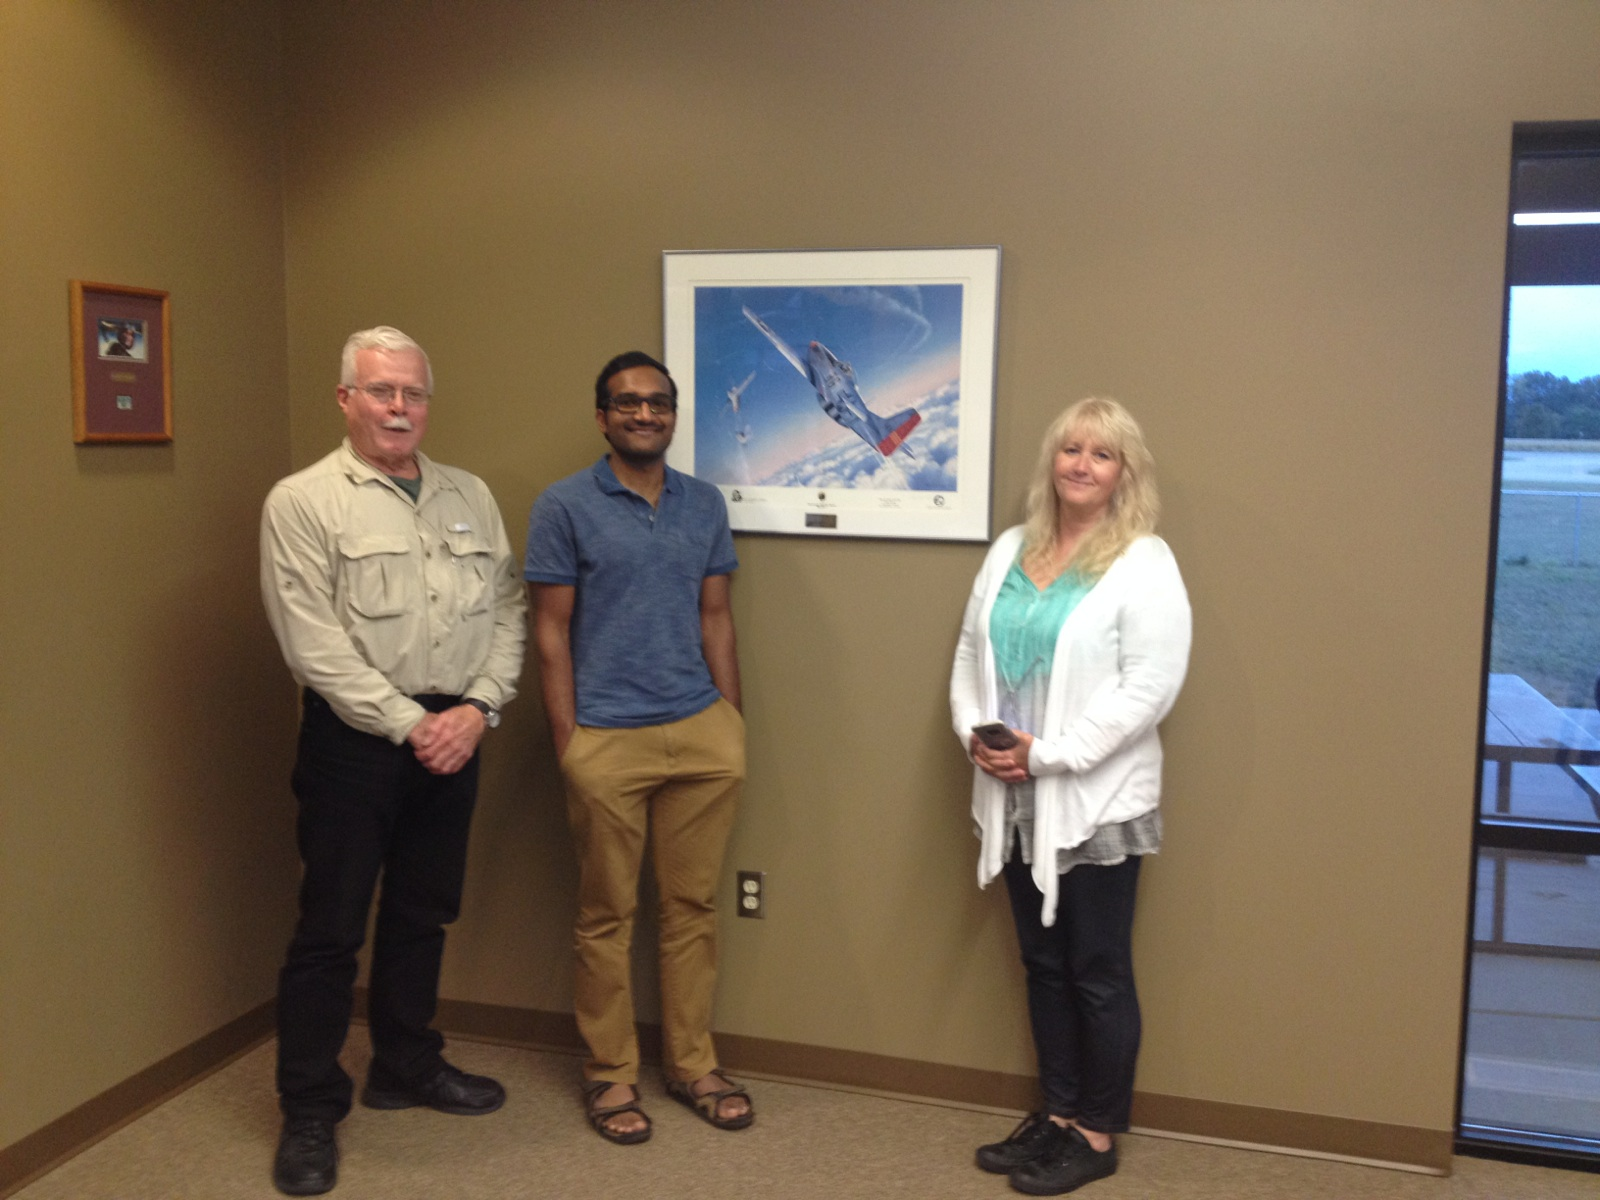 Branch County Flying Club